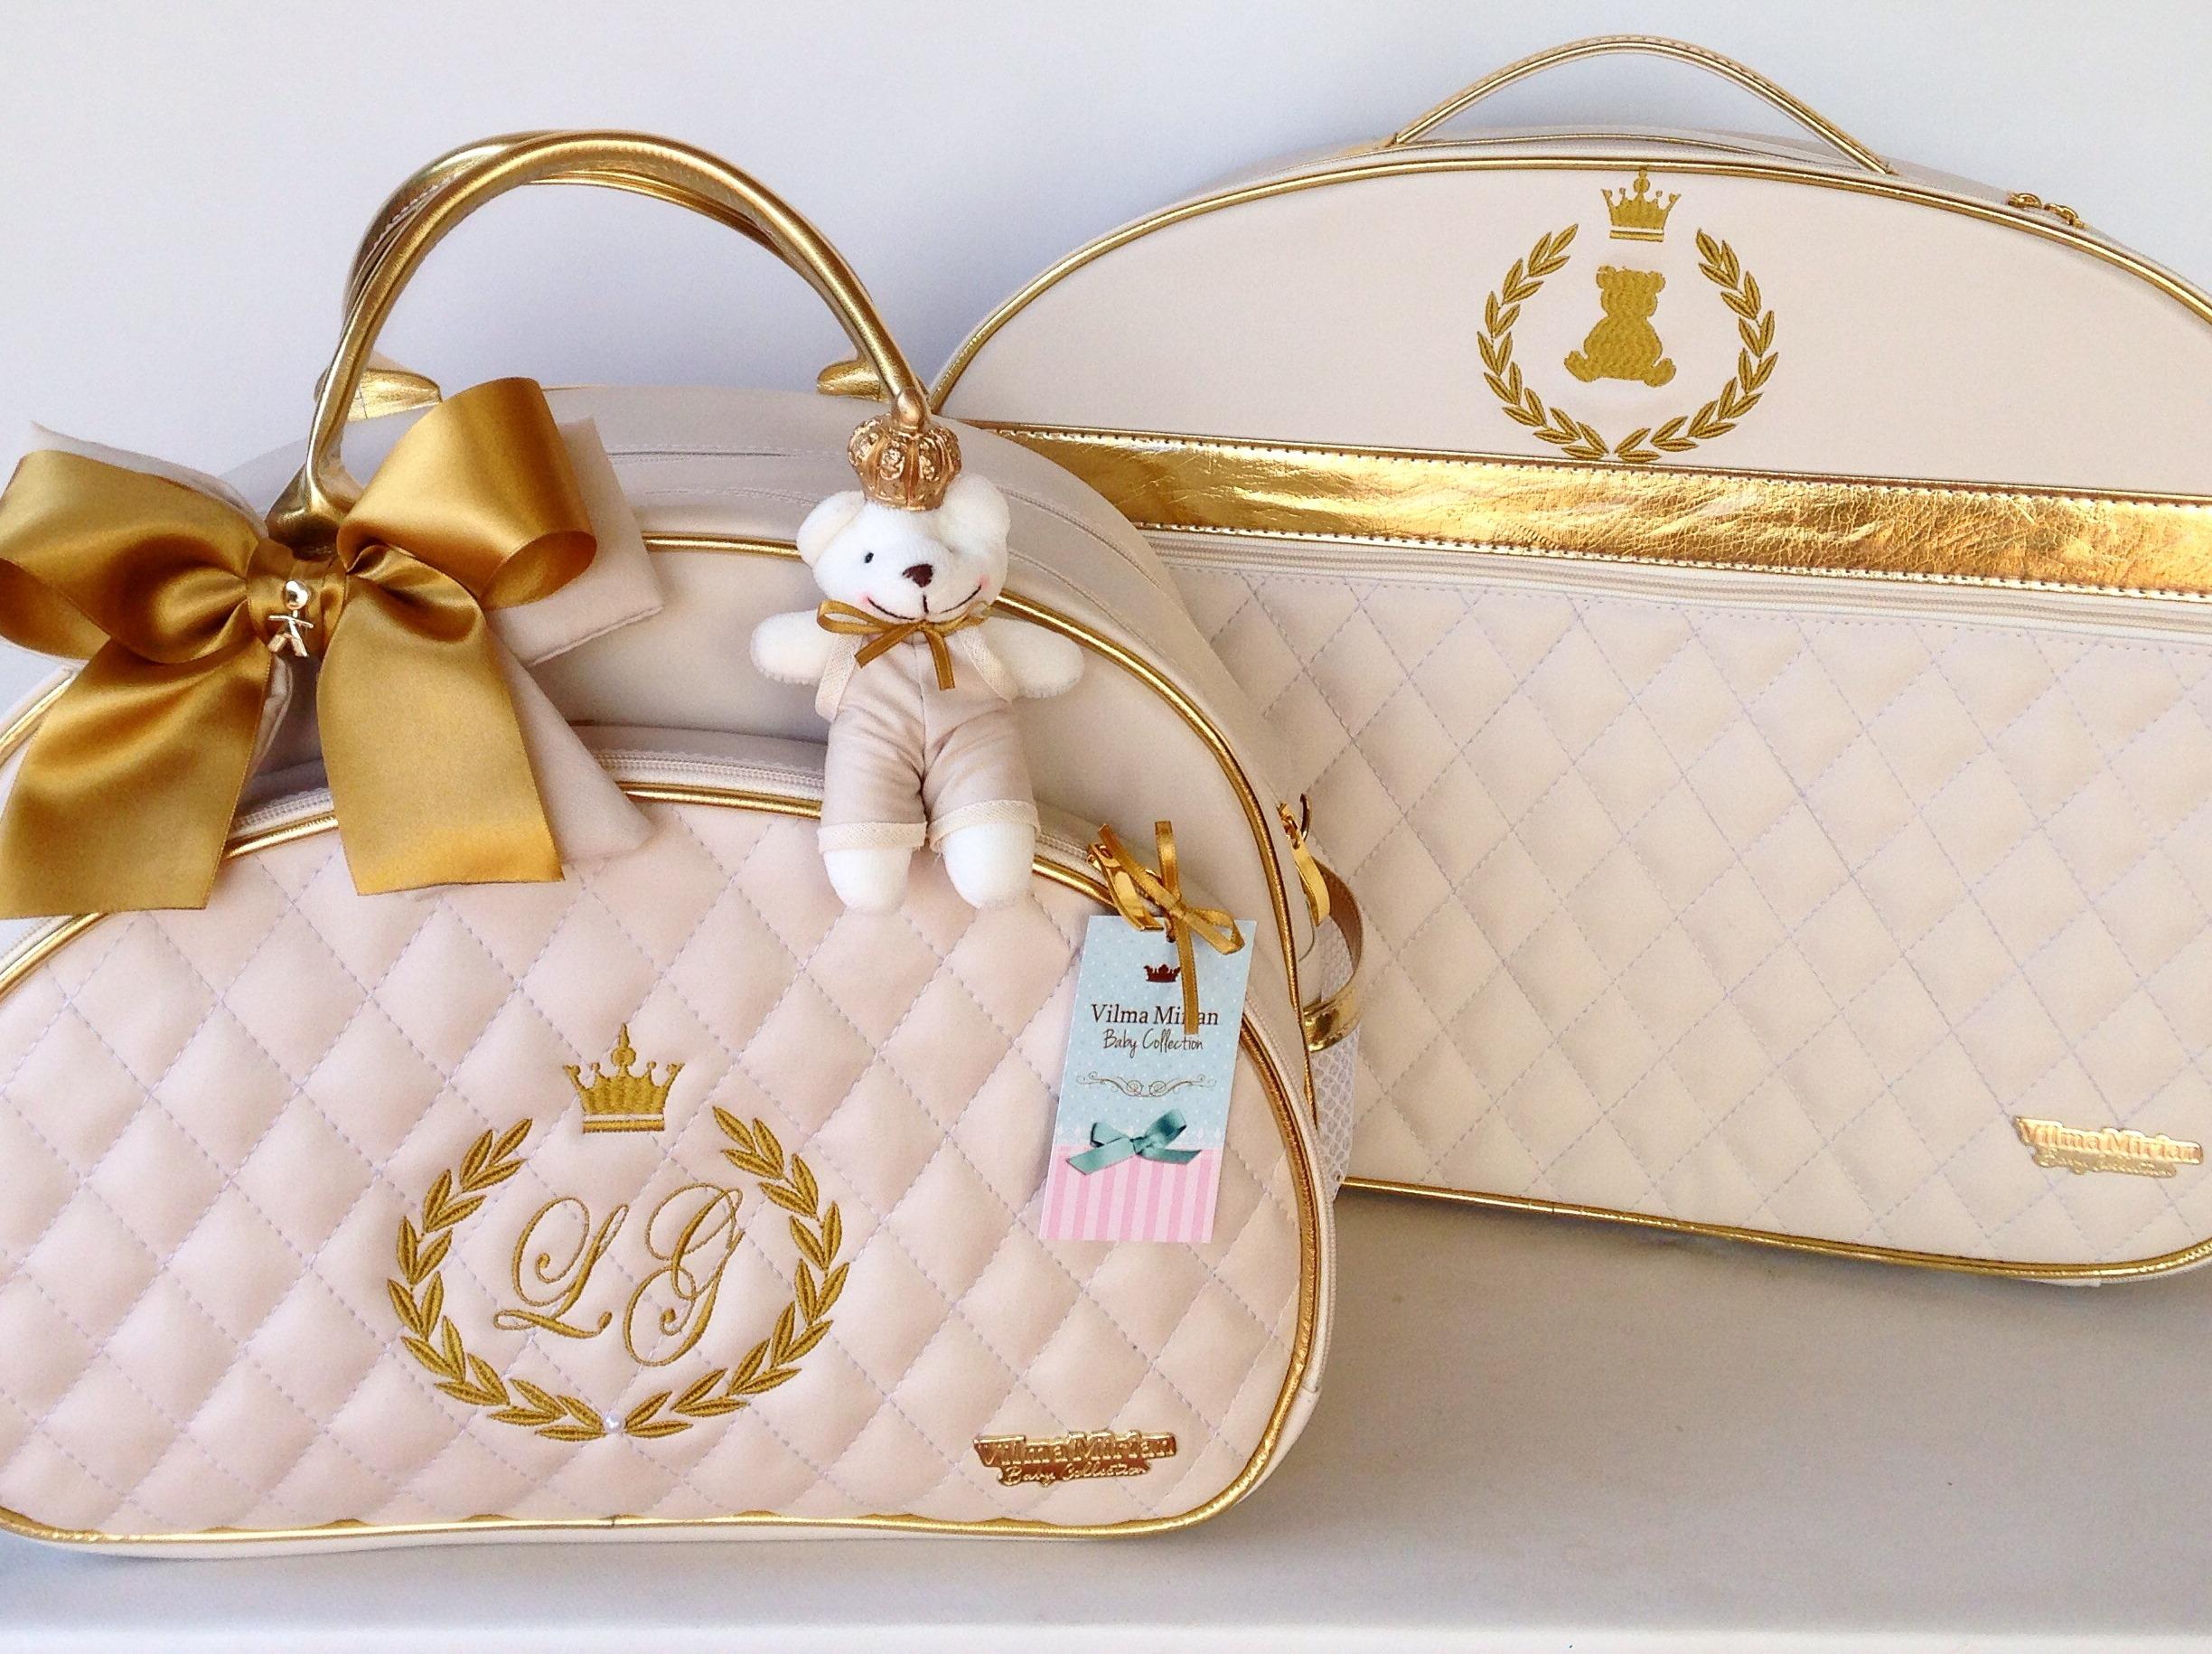 Bolsa Dourada De Maternidade : Bolsa matelass? bege com dourado vilma mirian baby